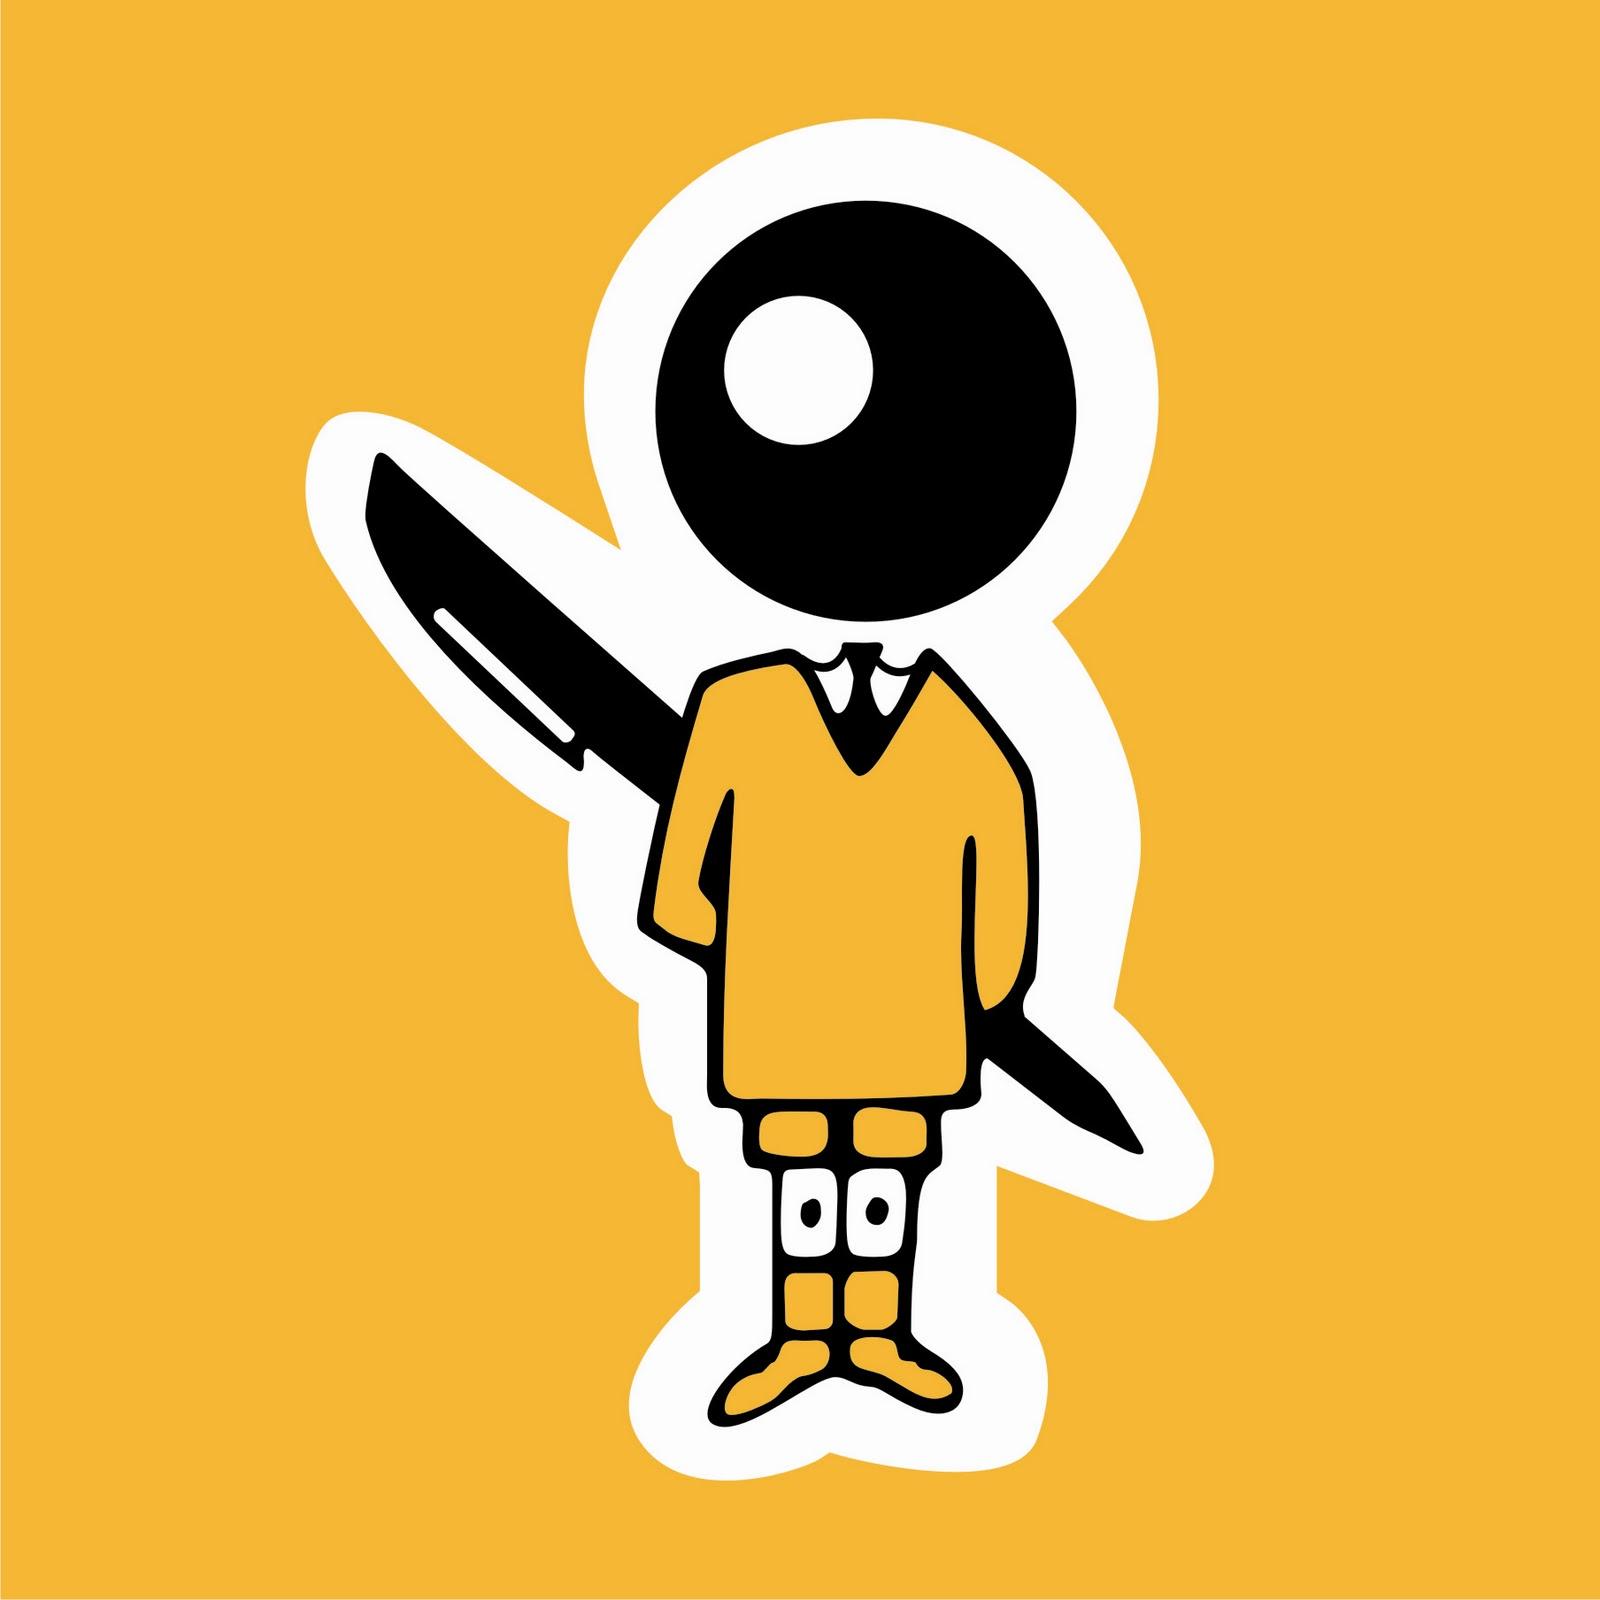 History of All Logos: Bic History